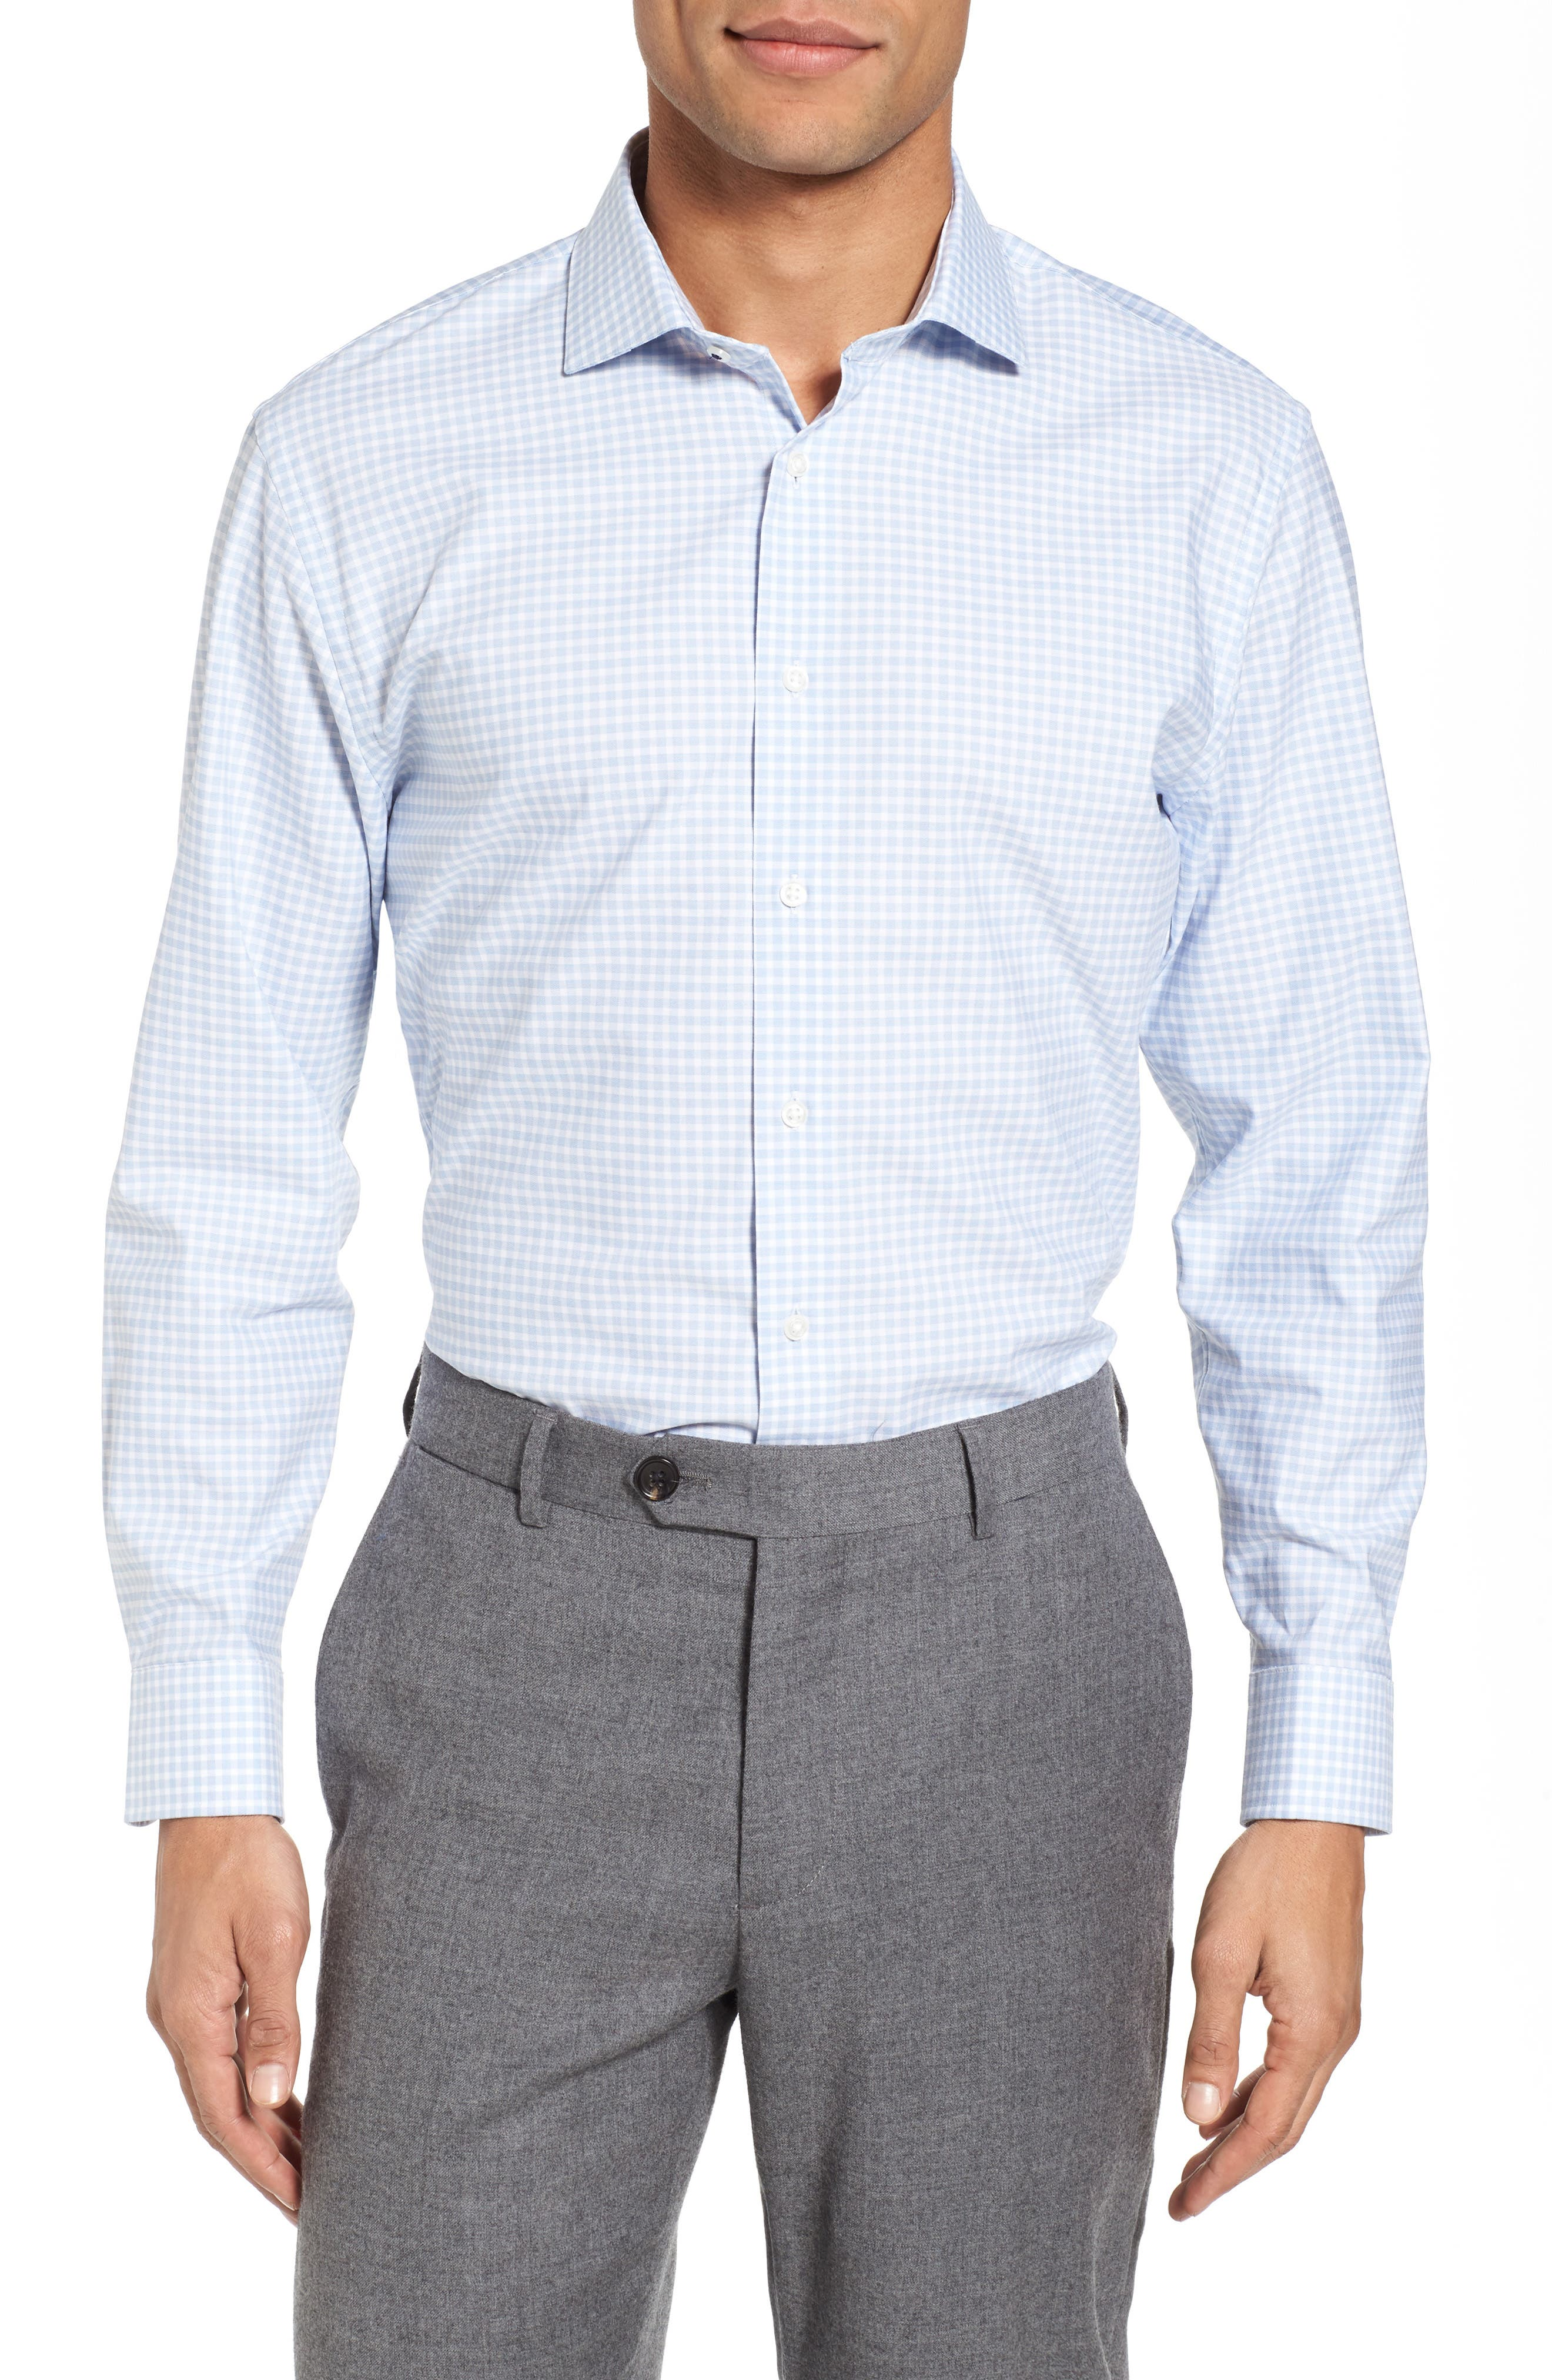 Tech-Smart Trim Fit Stretch Check Dress Shirt,                             Main thumbnail 1, color,                             420